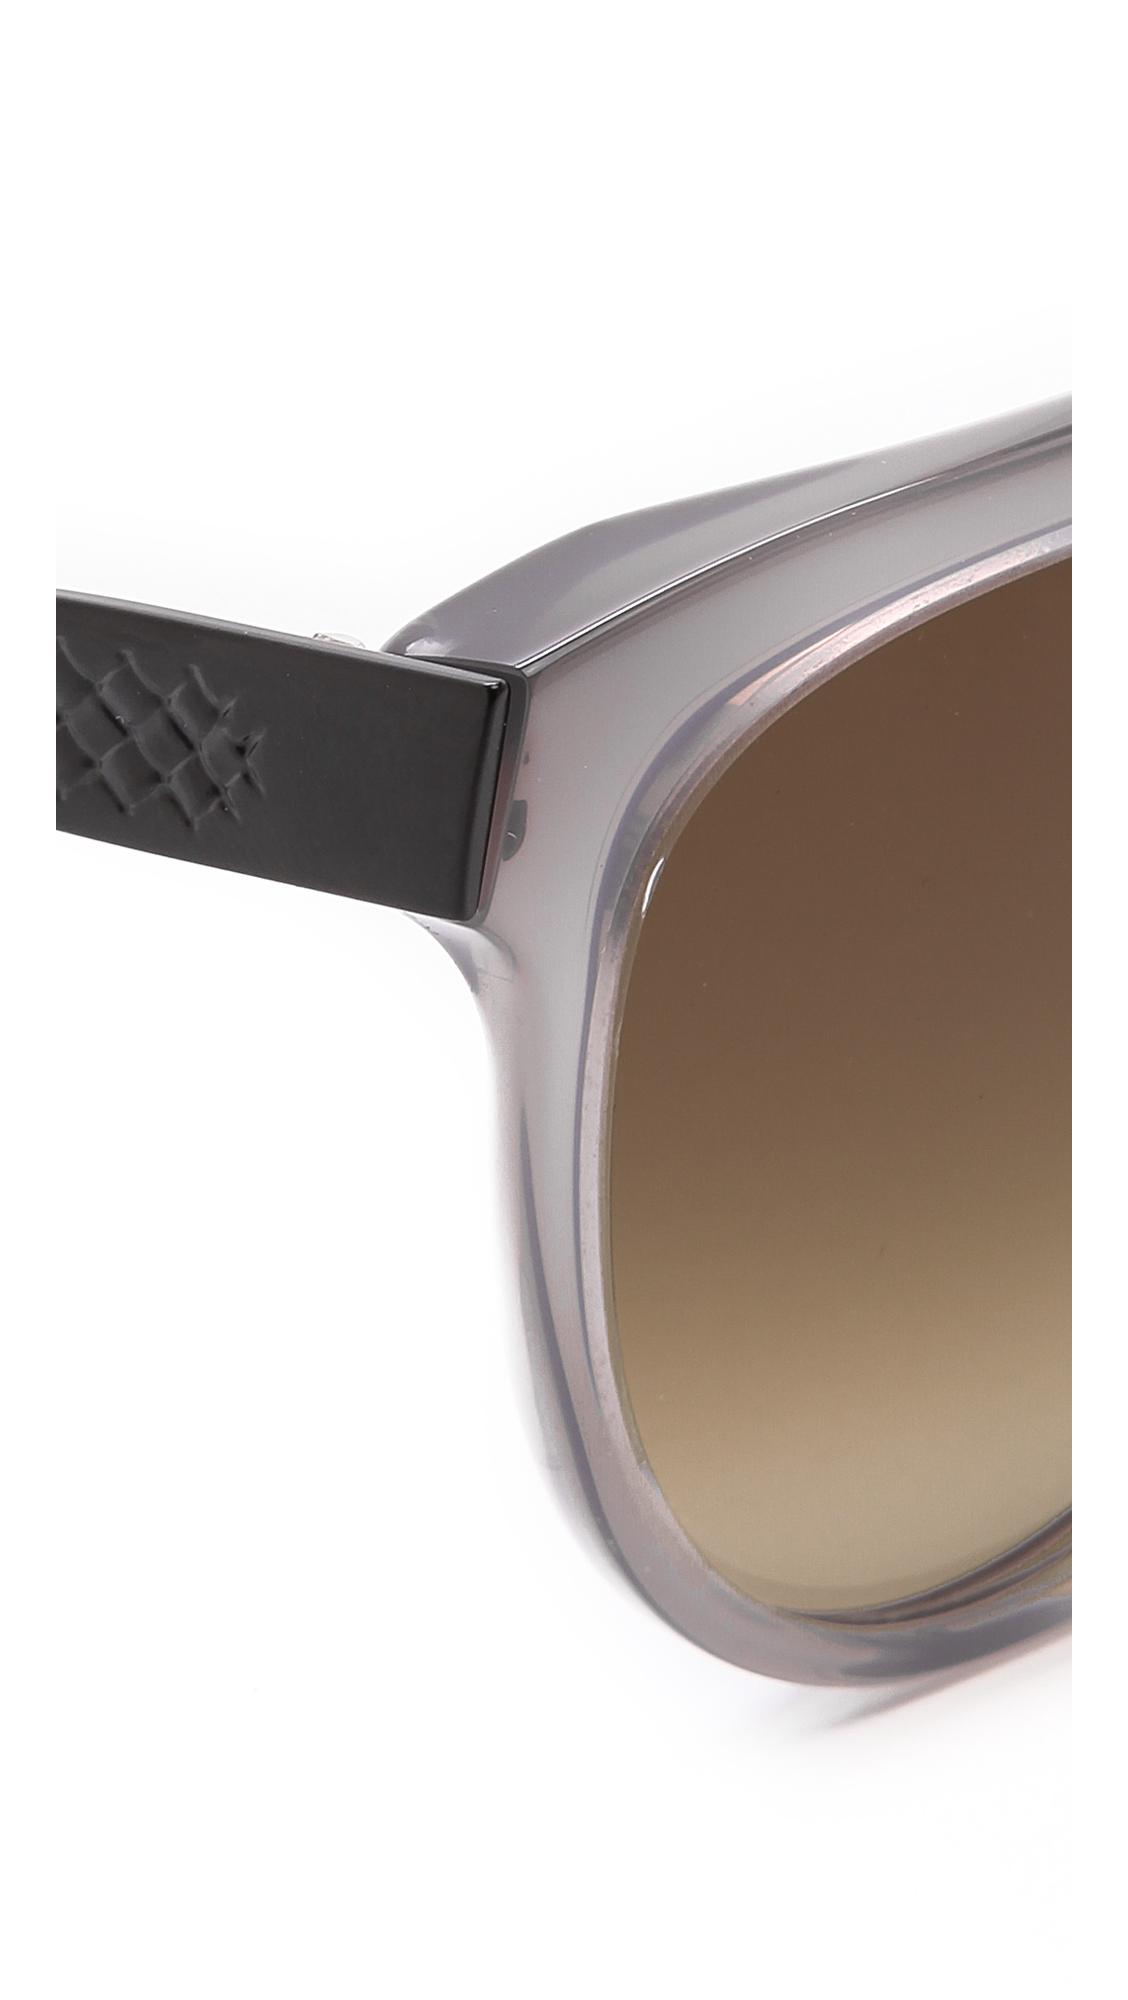 Bottega Veneta Cat Eye Sunglasses Light Brown Brown